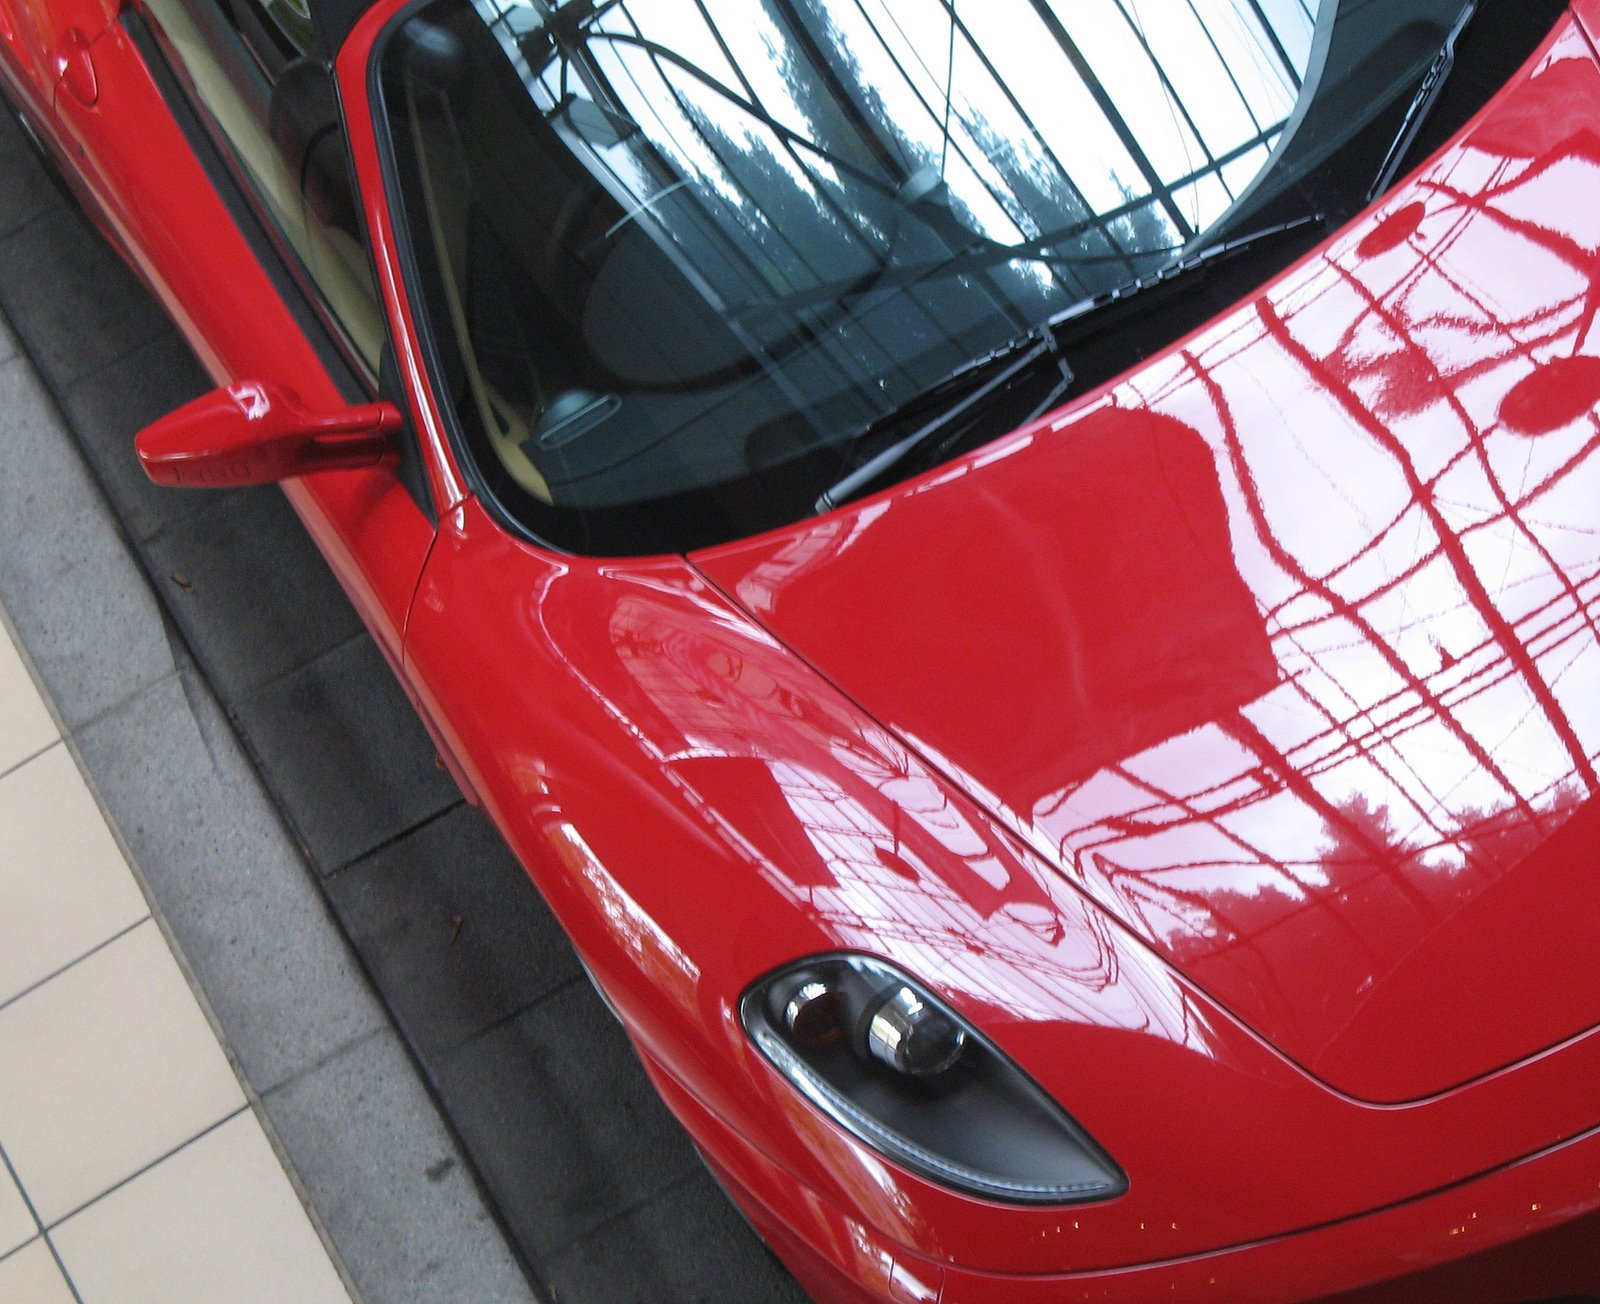 [4-27-2008+fast+red+car.jpg]